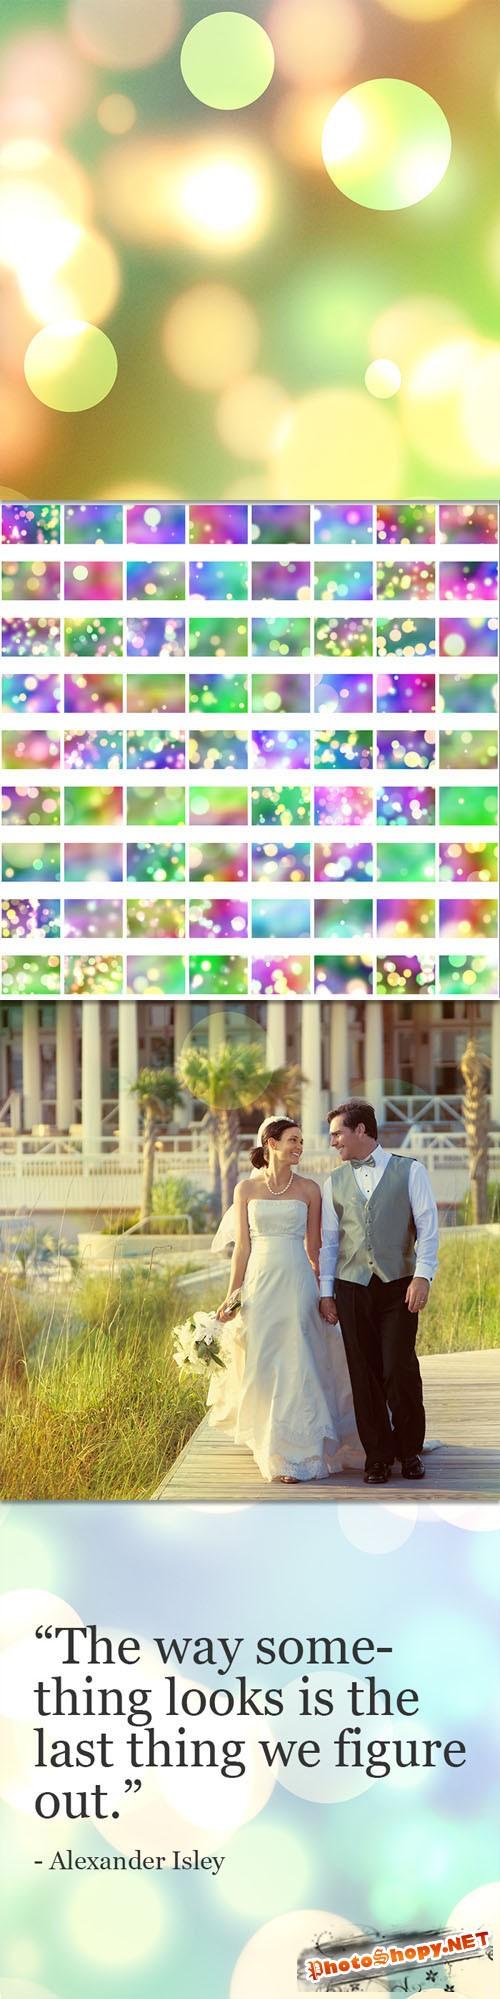 15 Vibrant Bokeh Backgrounds